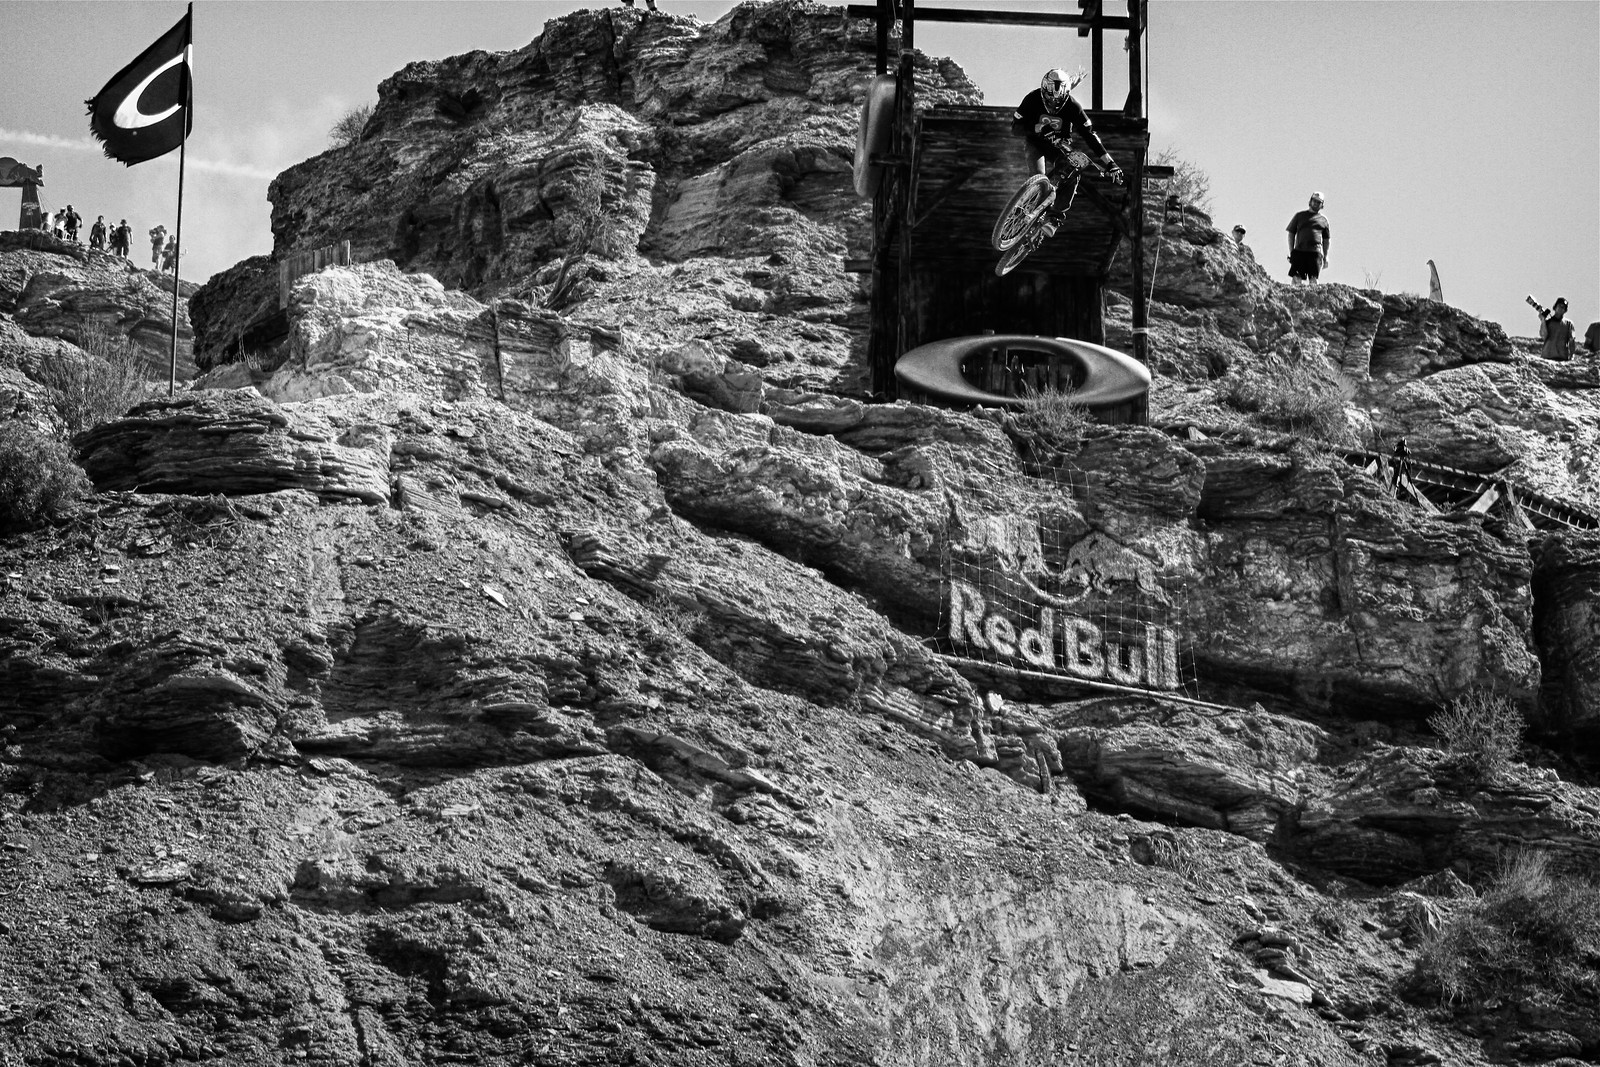 Wil White - Malcolm Mclaws - Mountain Biking Pictures - Vital MTB